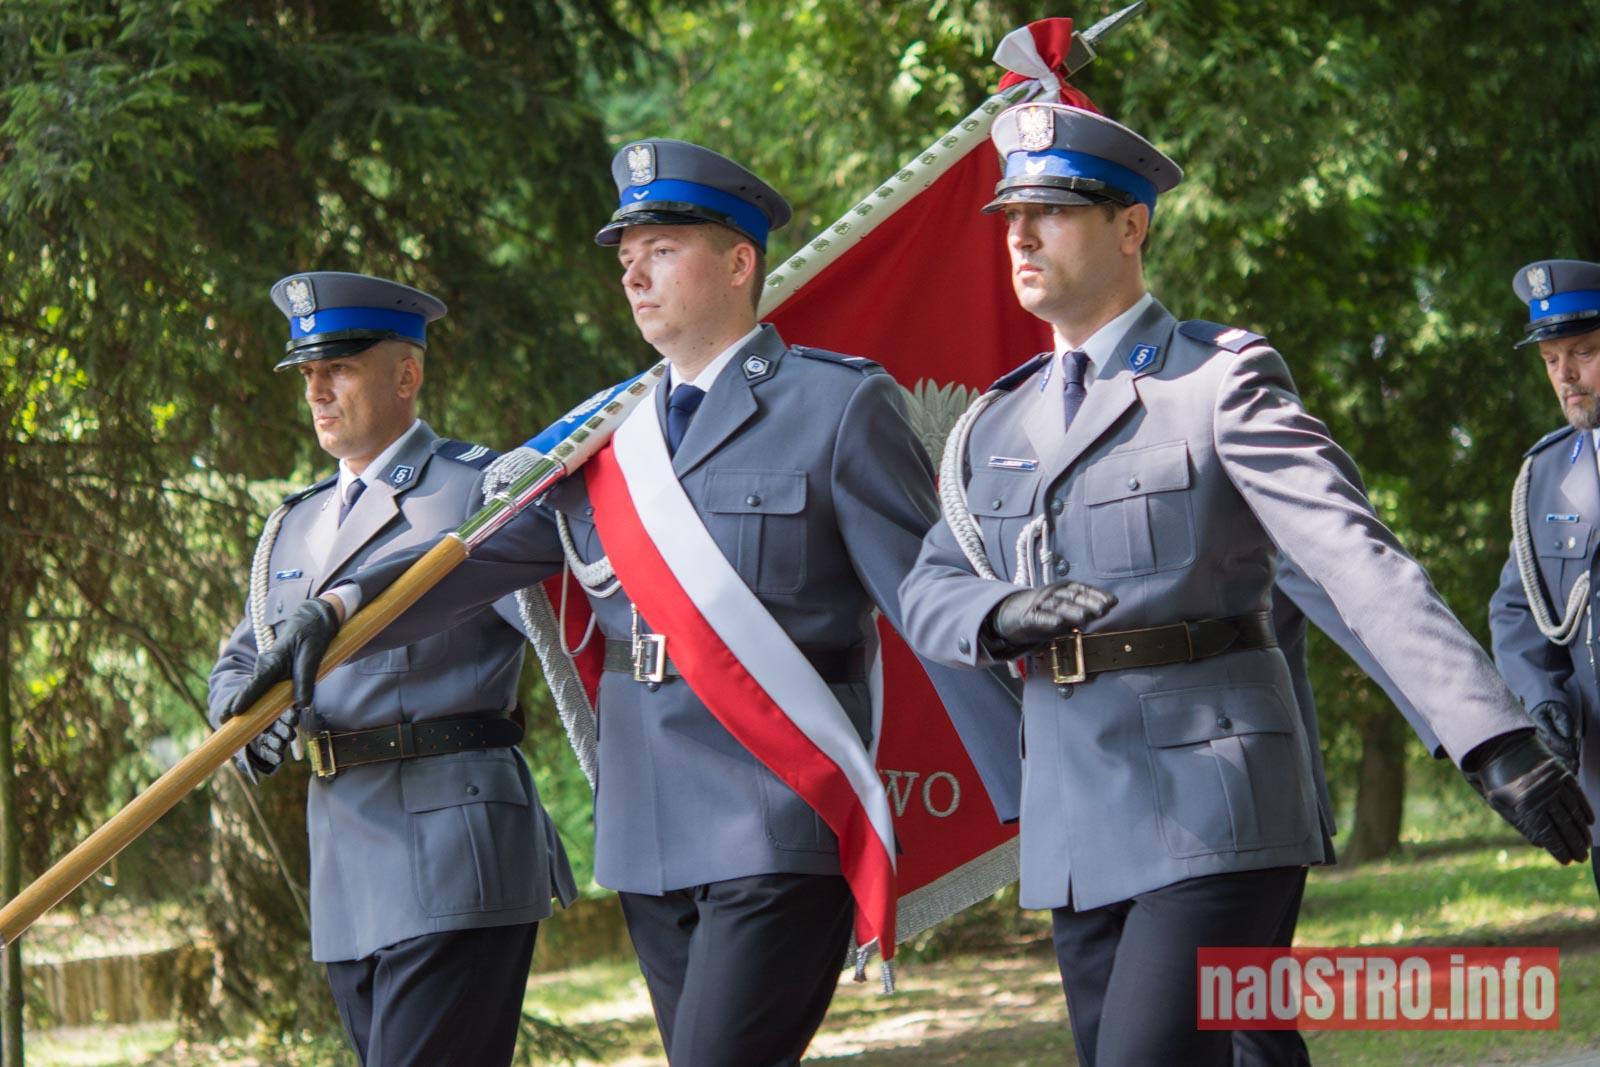 NaOSTRO swieto policji-15